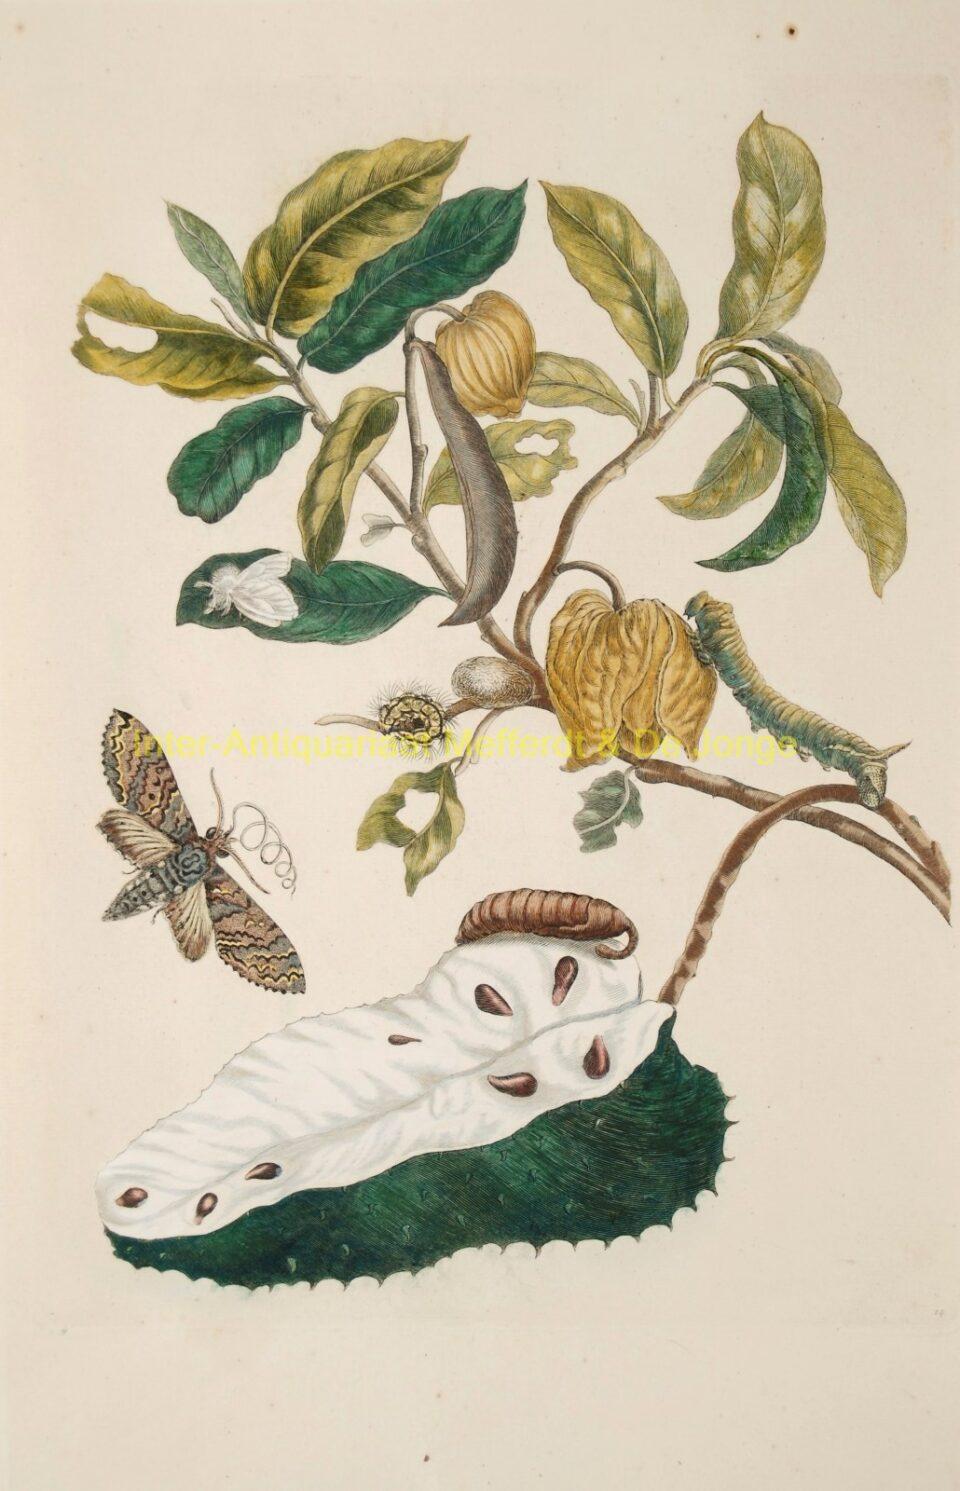 Maria Sibylla Merian - Zuurzak (Soursop with owlet moth)